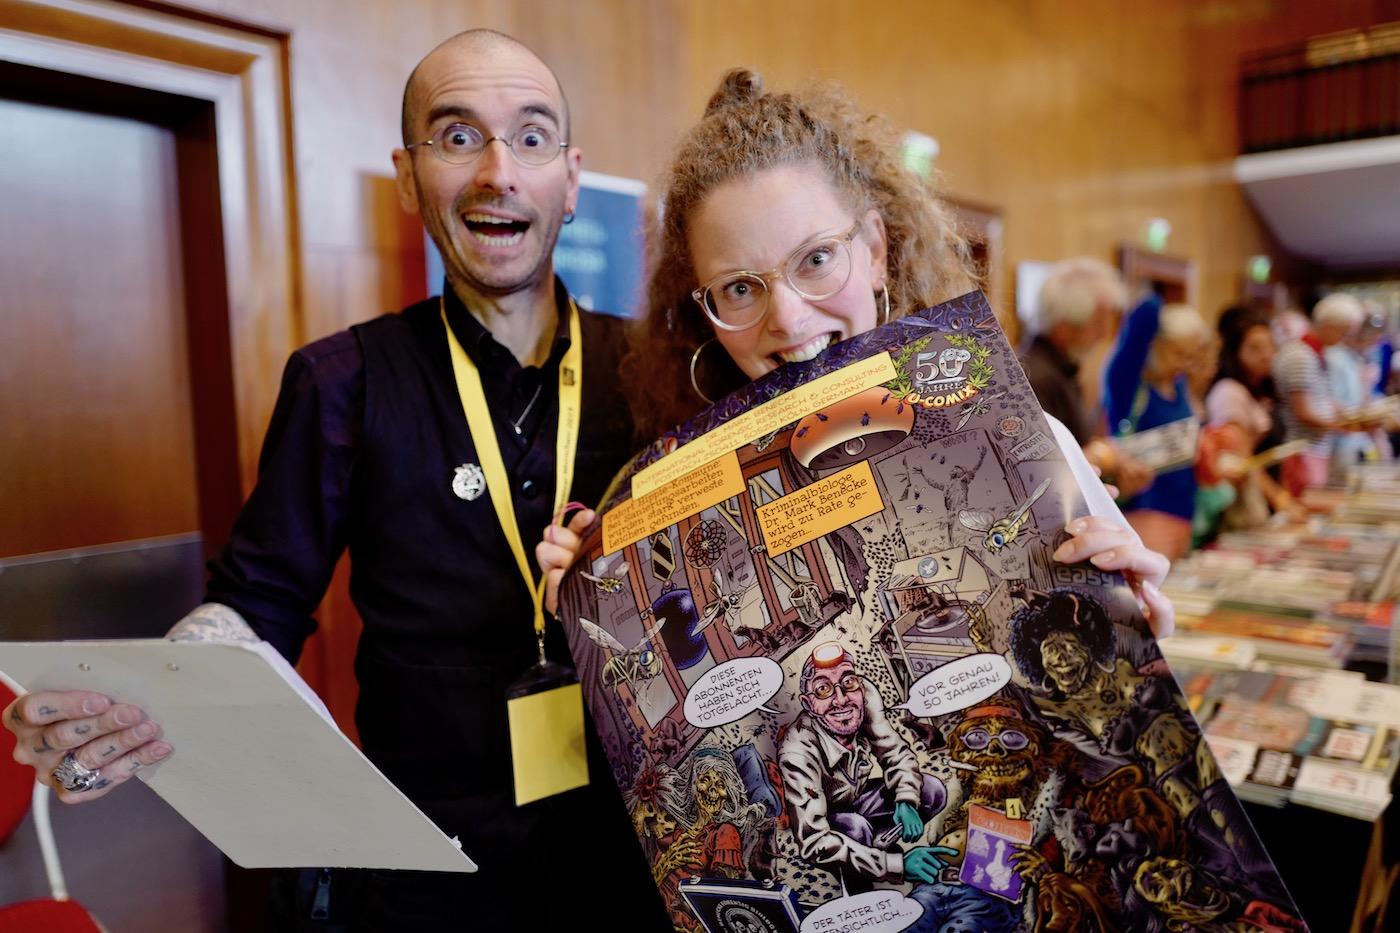 mark_benecke_comic_festival_muenchen_munich_comic_con_2019 - 72.jpg